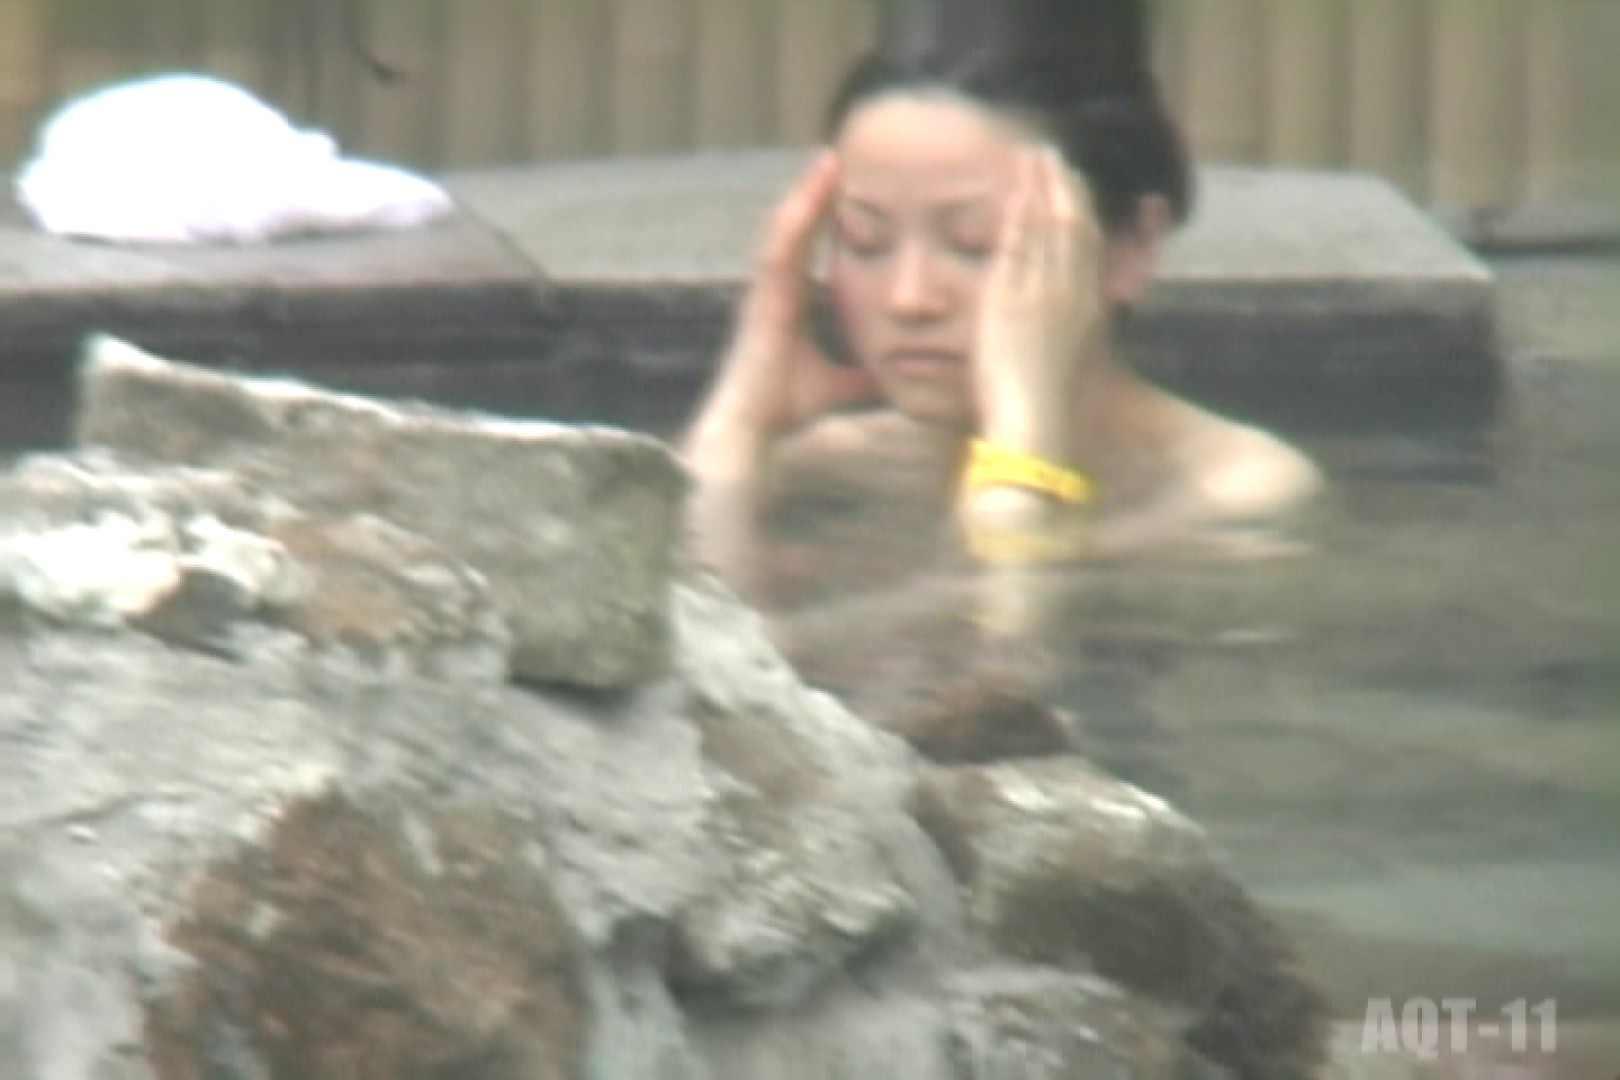 Aquaな露天風呂Vol.802 女体盗撮 盗み撮りSEX無修正画像 85連発 41